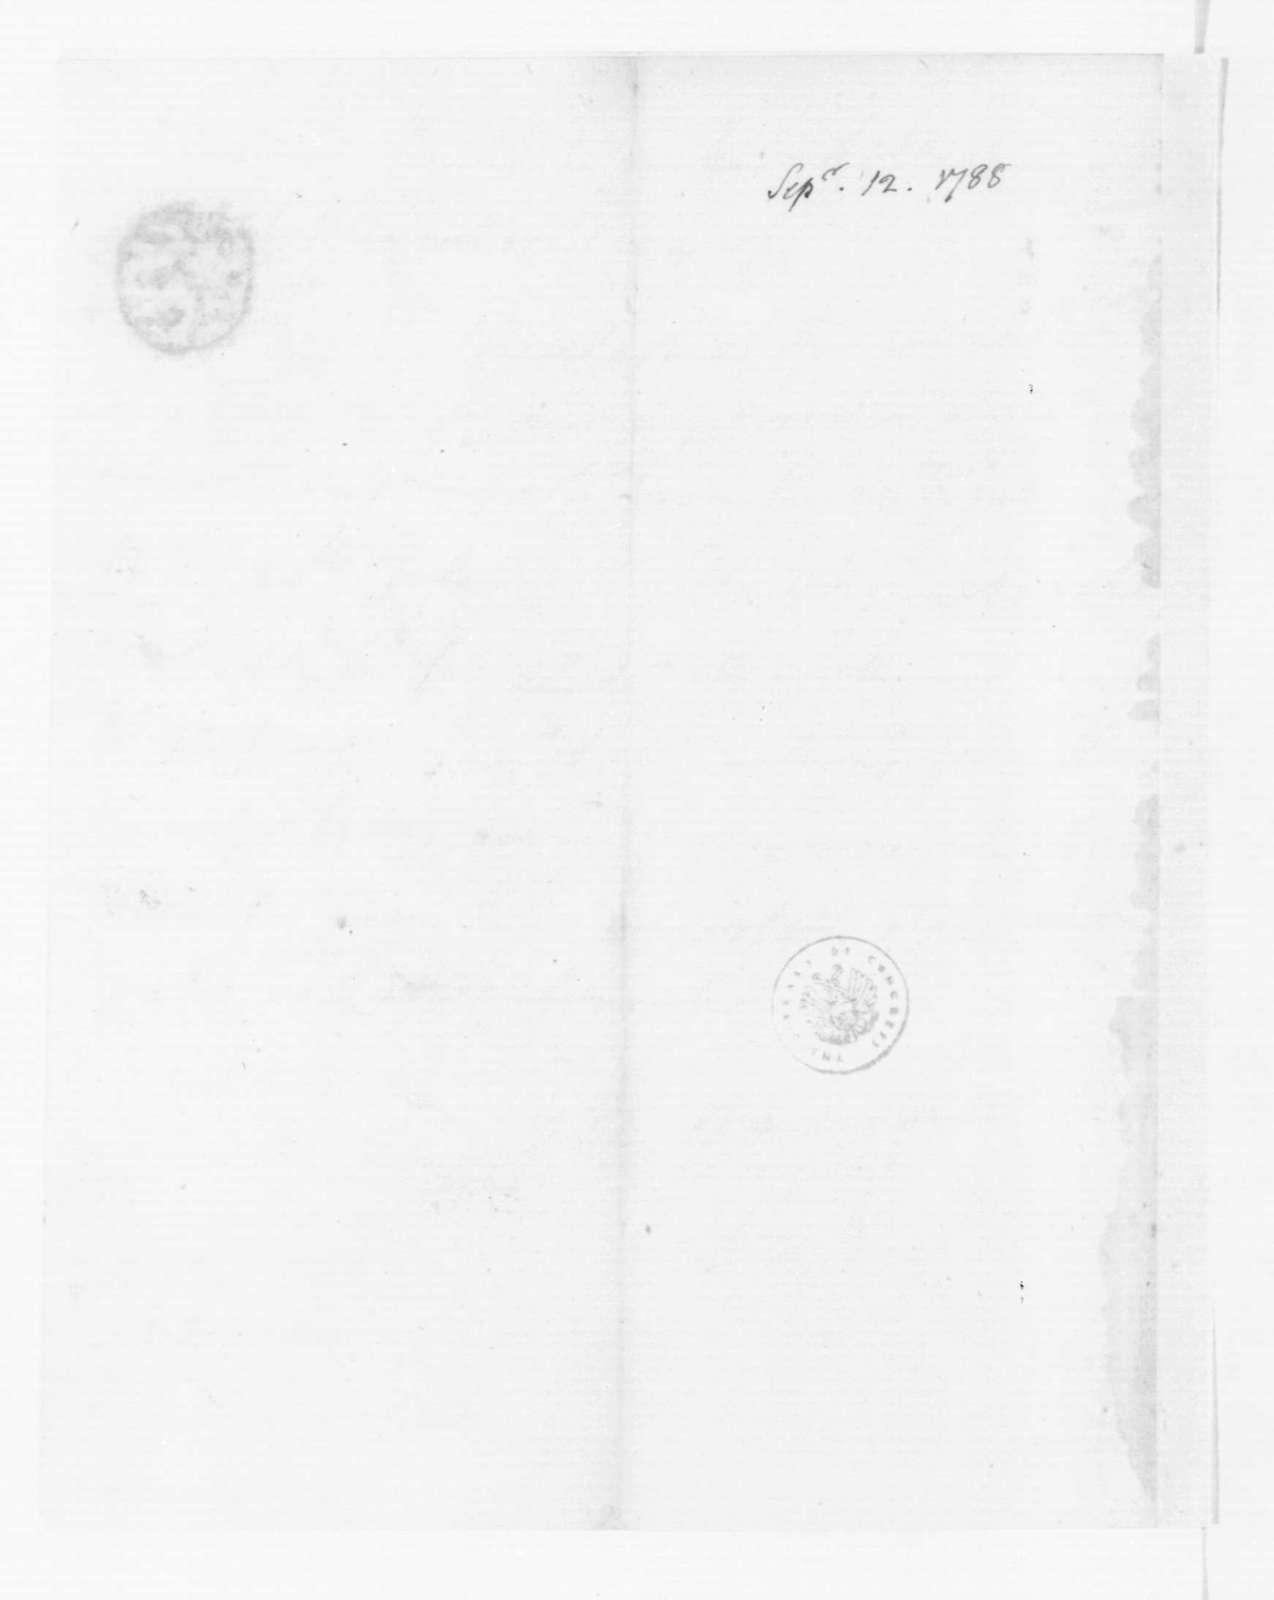 Edmund Randolph to James Madison, September 12, 1788.